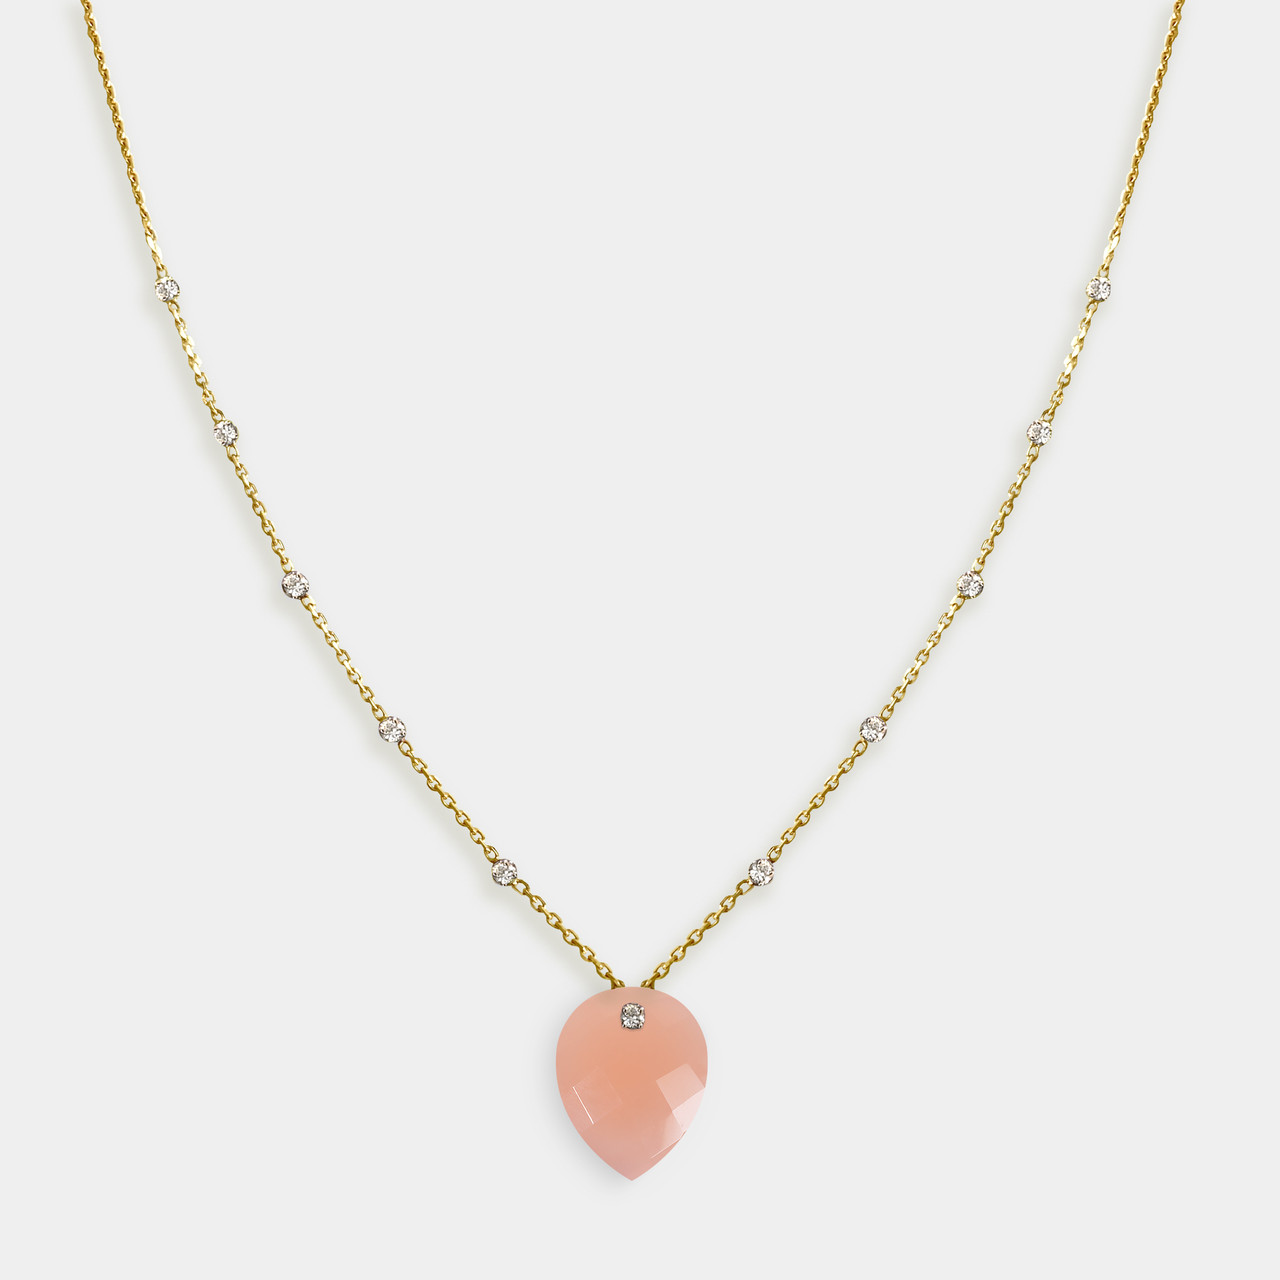 Collier 11 Diamants Calcedoine Rose, Collier Or Femme Calcedoine Rose